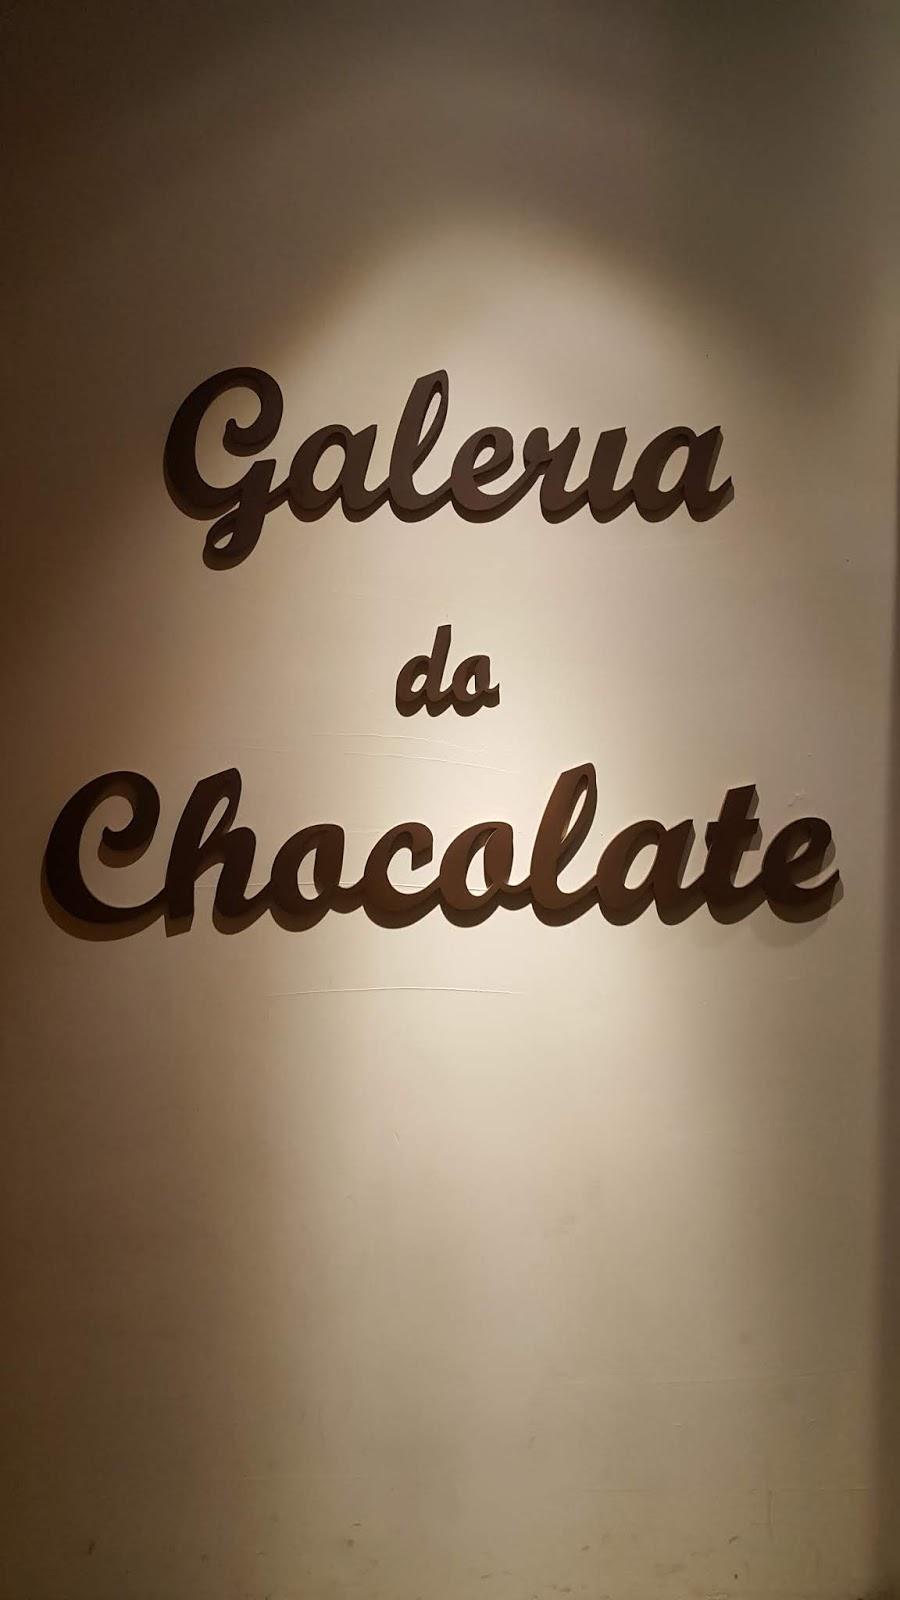 Reino do Chocolate